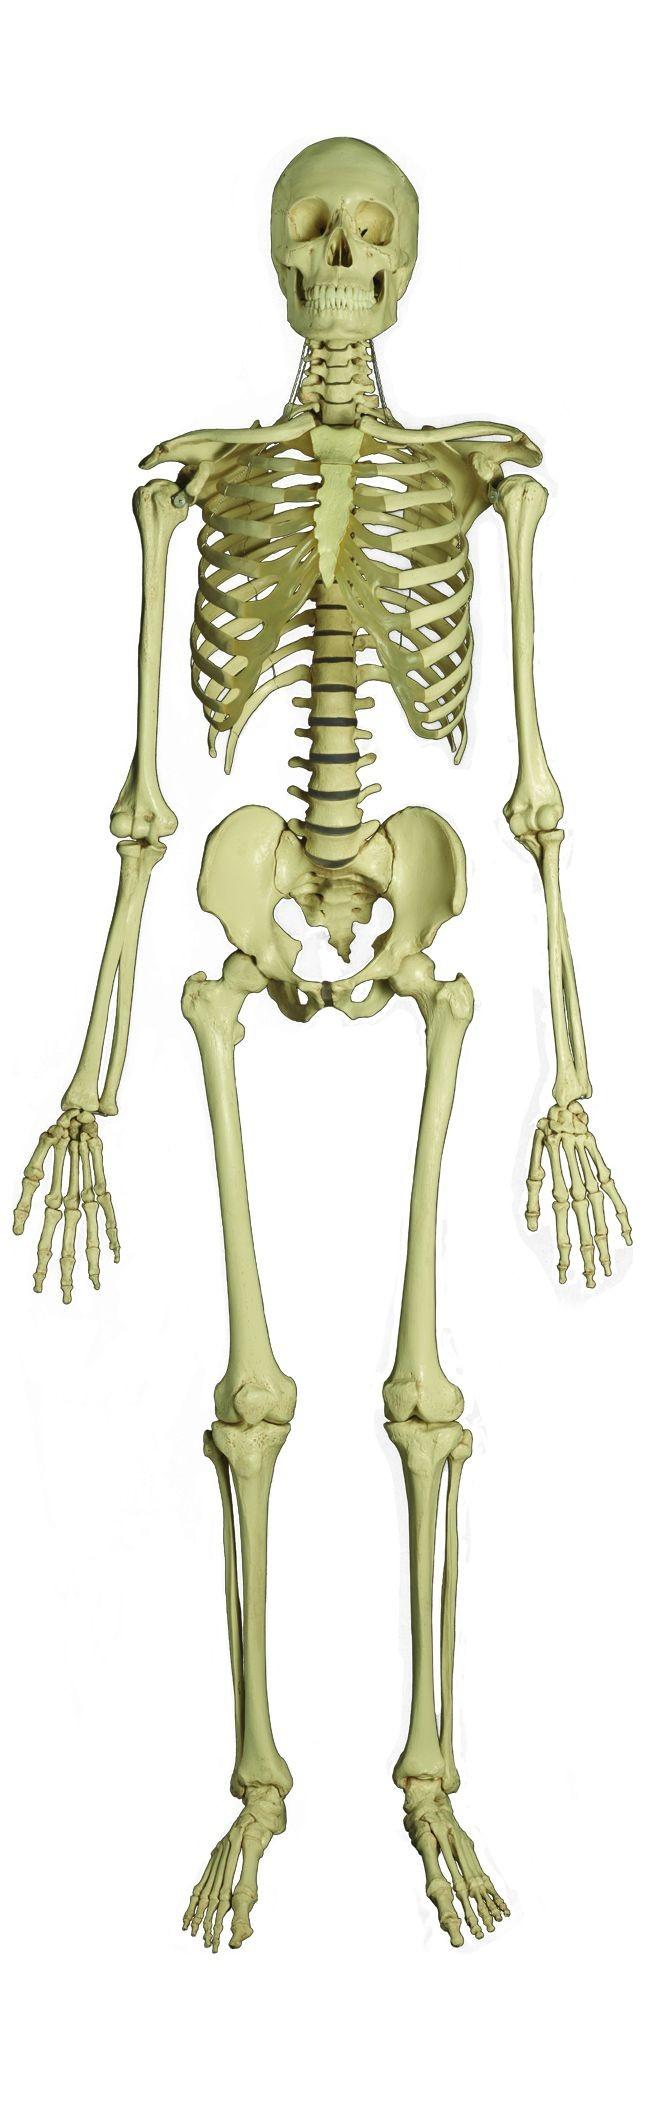 medium resolution of download full human skeleton clipart human skeleton human body